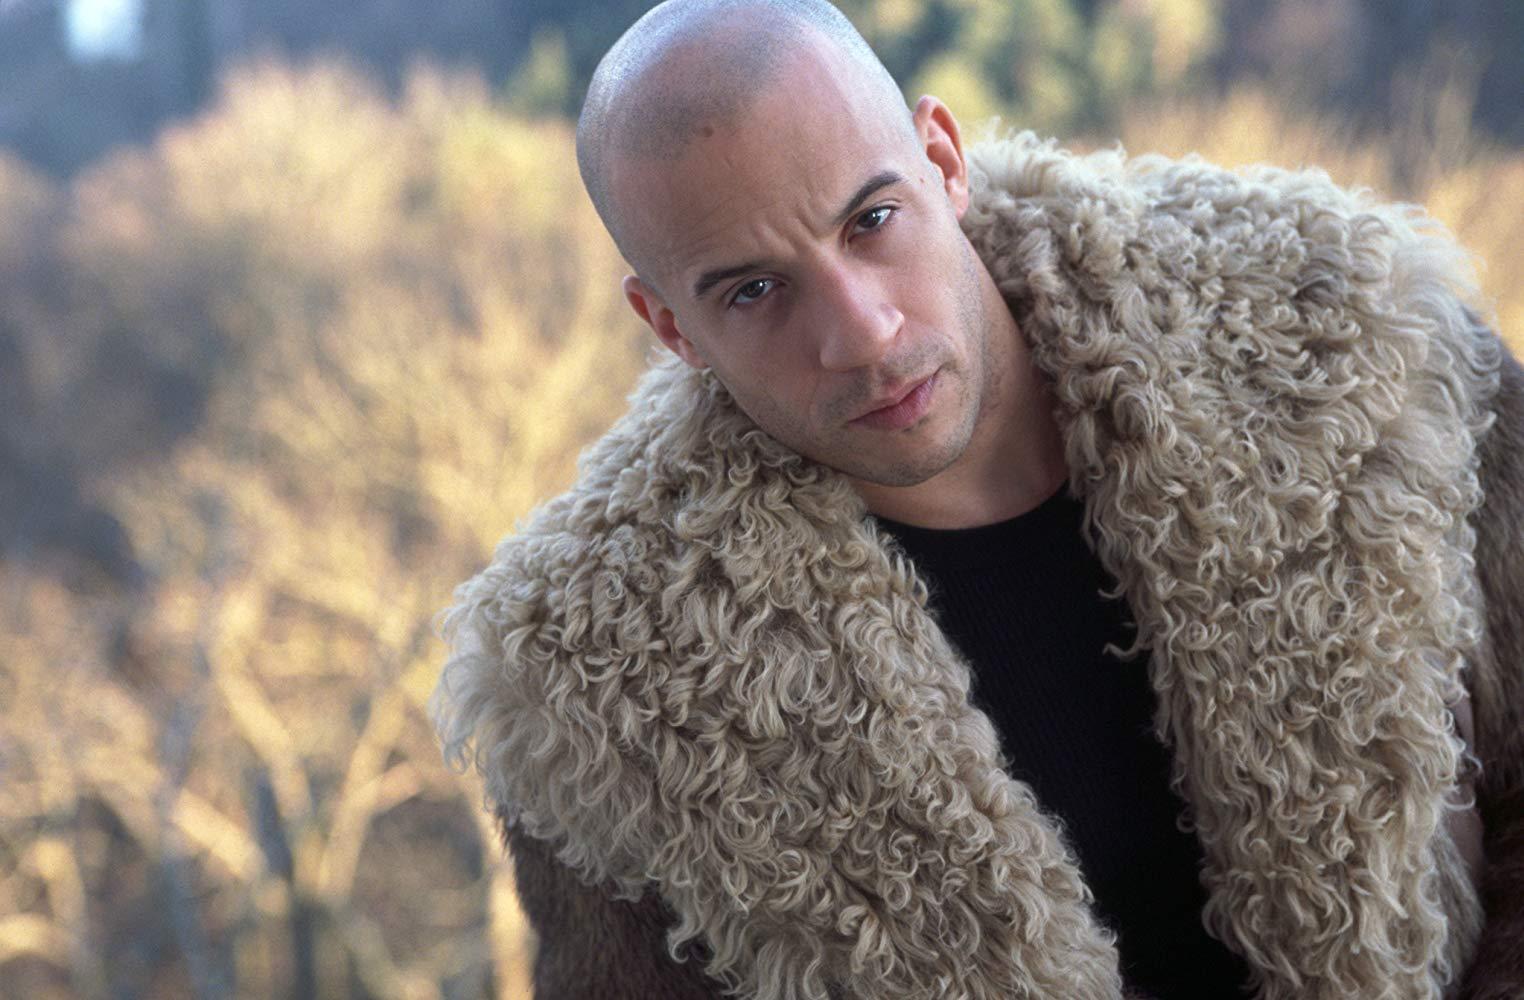 Vin Diesel as Xander Cage in xXx (2002)